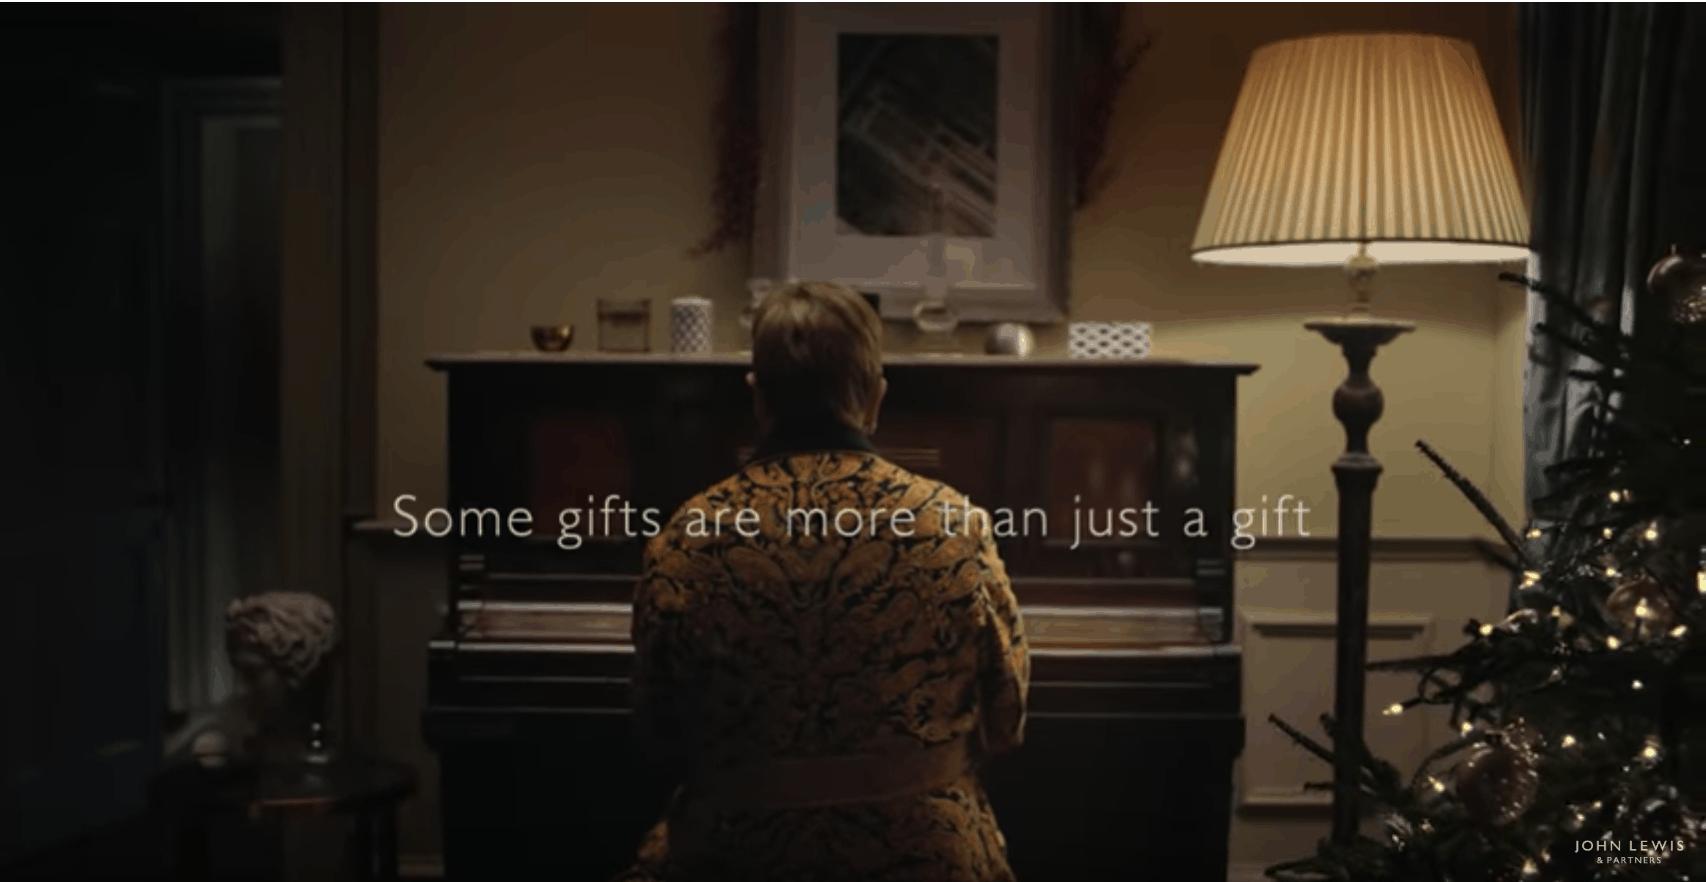 John Lewis Christmas Advert vs the Lidl Response